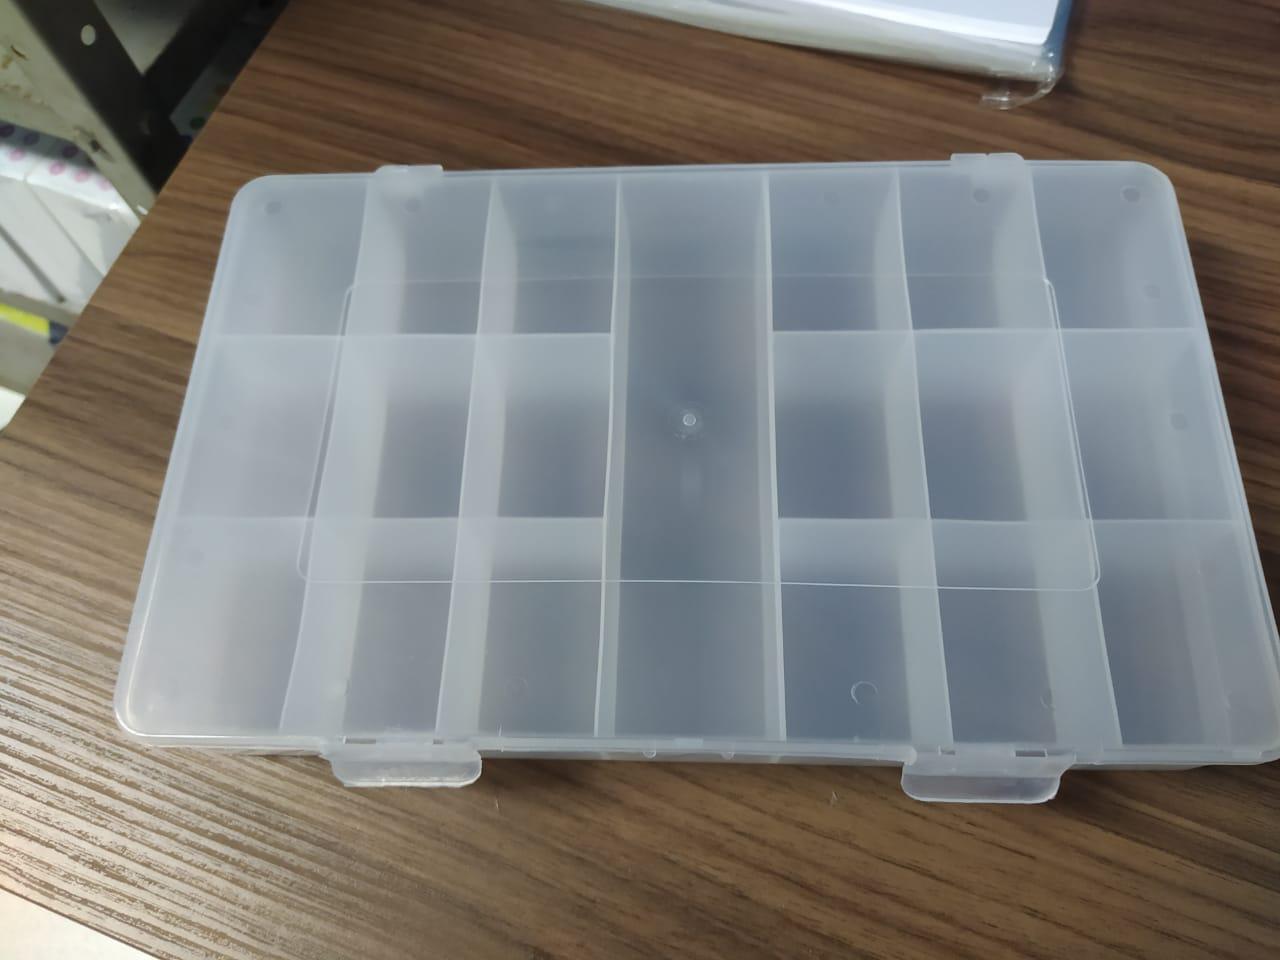 Estojo Plástico Multiuso Transparente grande